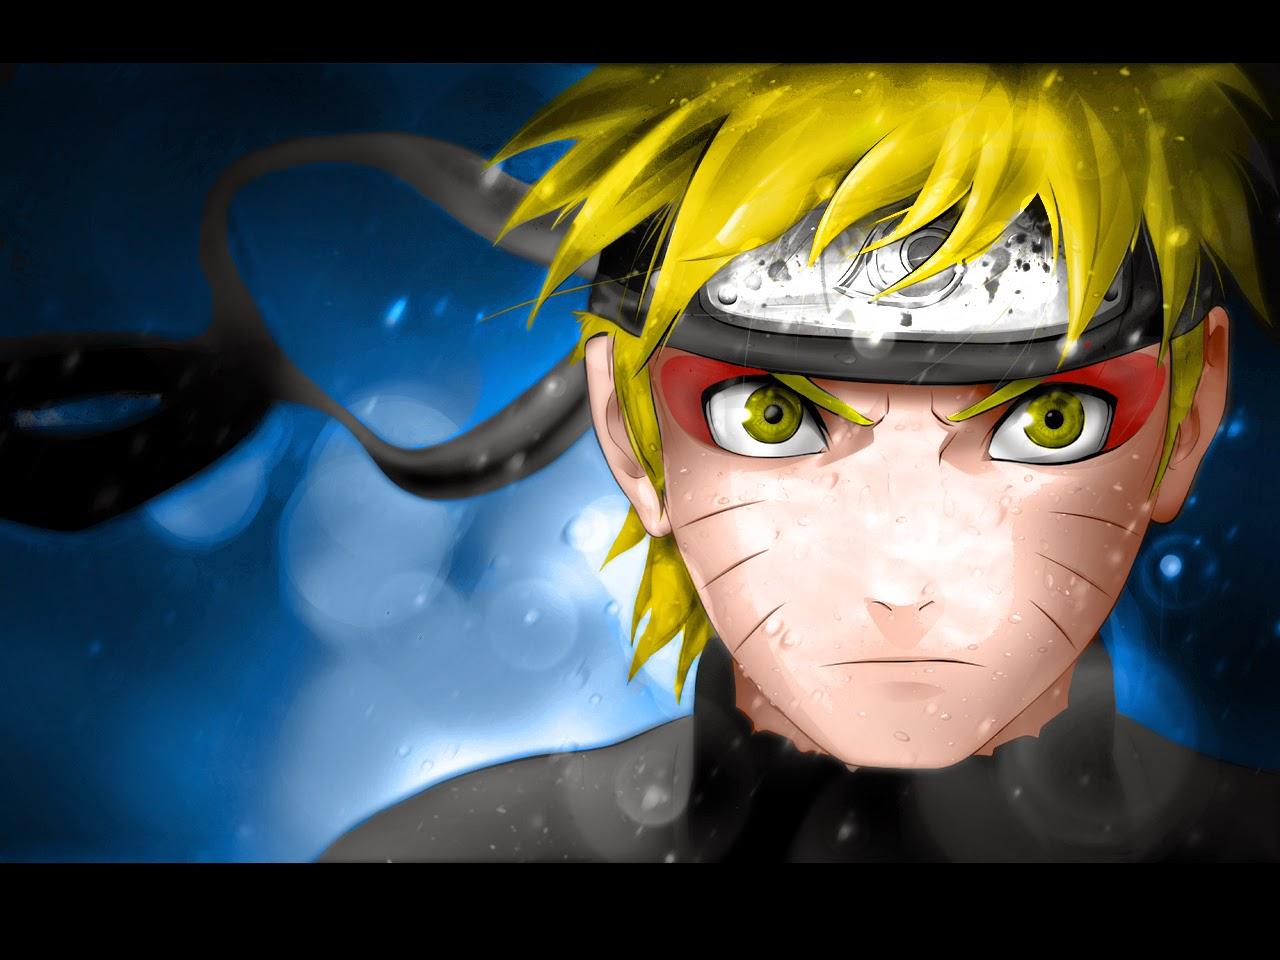 Naruto Arkaplan Hd Wallpaper